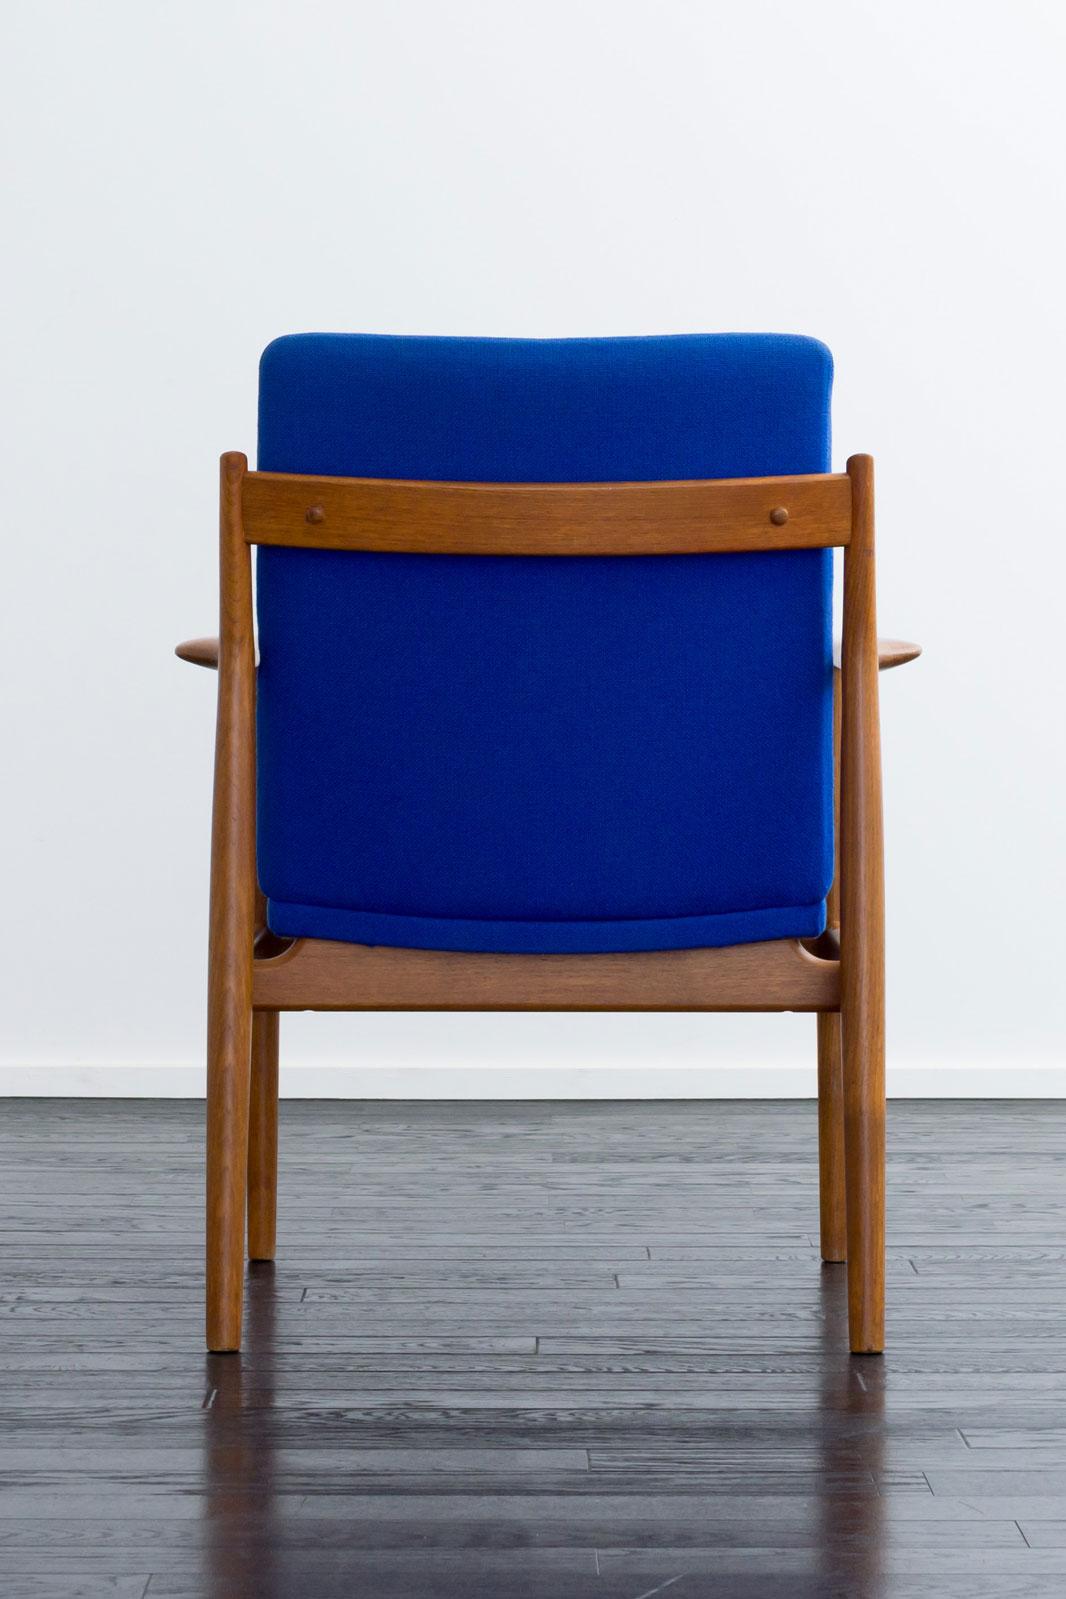 #431 Arm Chair by Arne Vodder